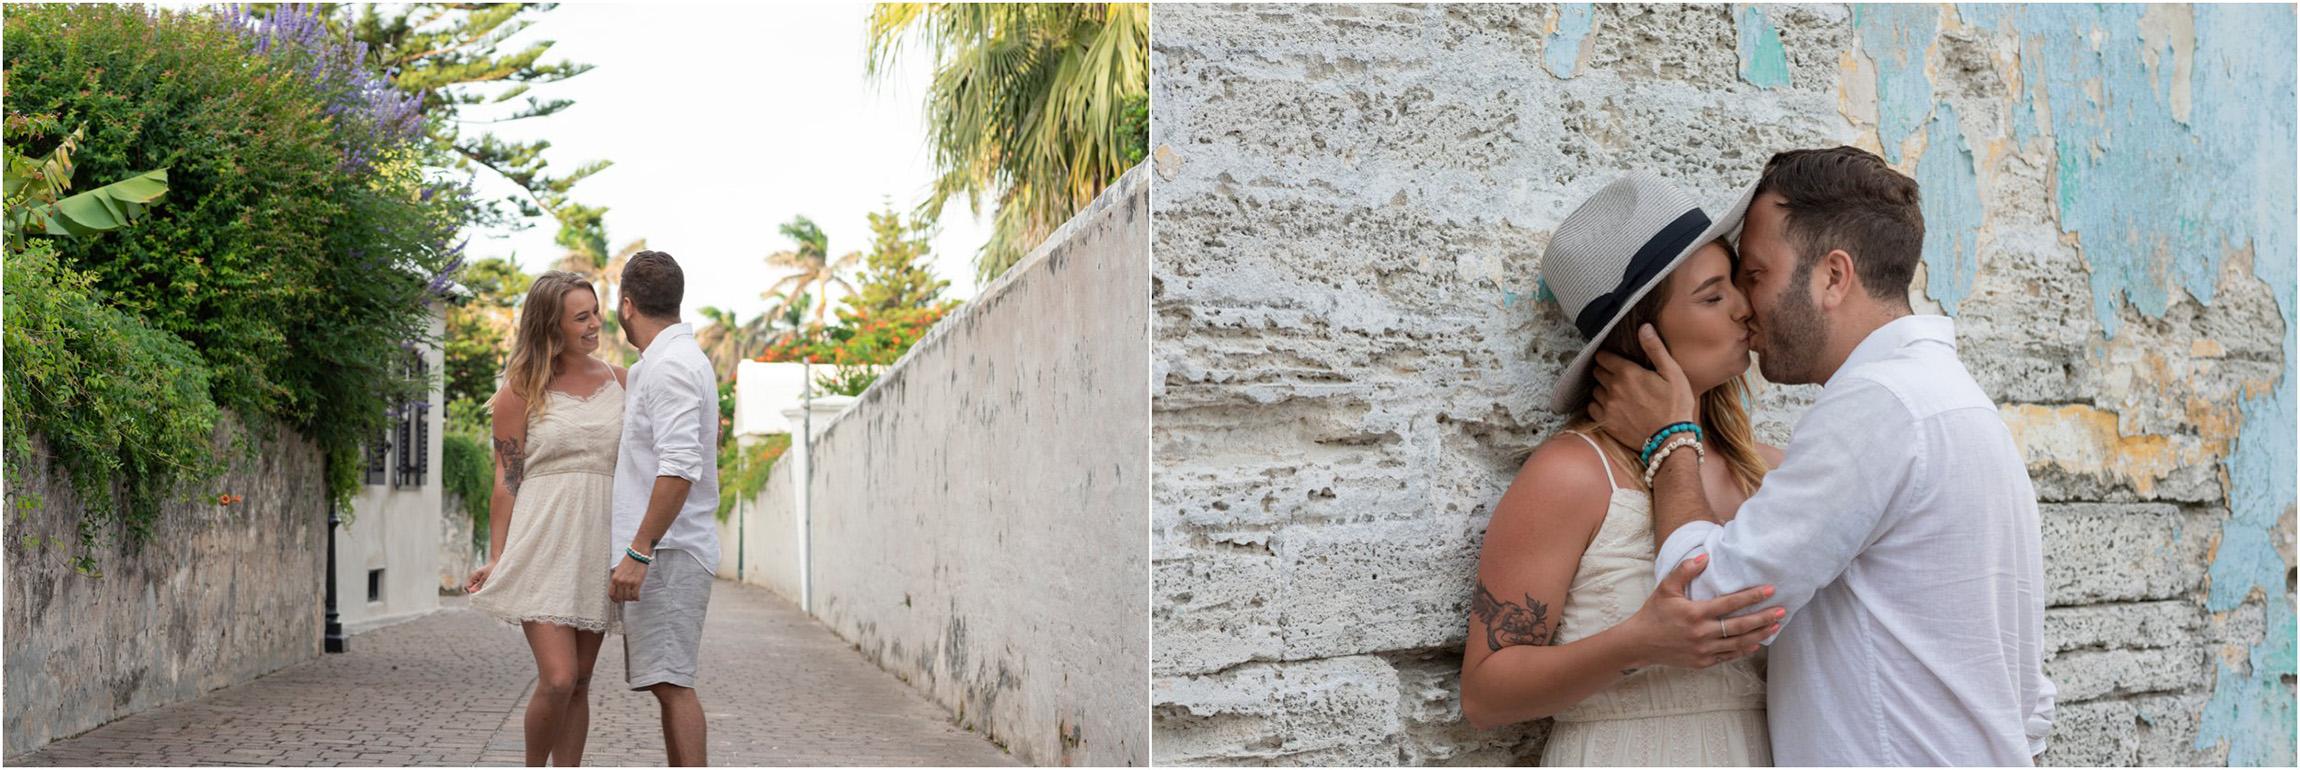 ©FianderFoto_Bermuda Engagement Photographer_St Georges_Danielle_David_007.jpg